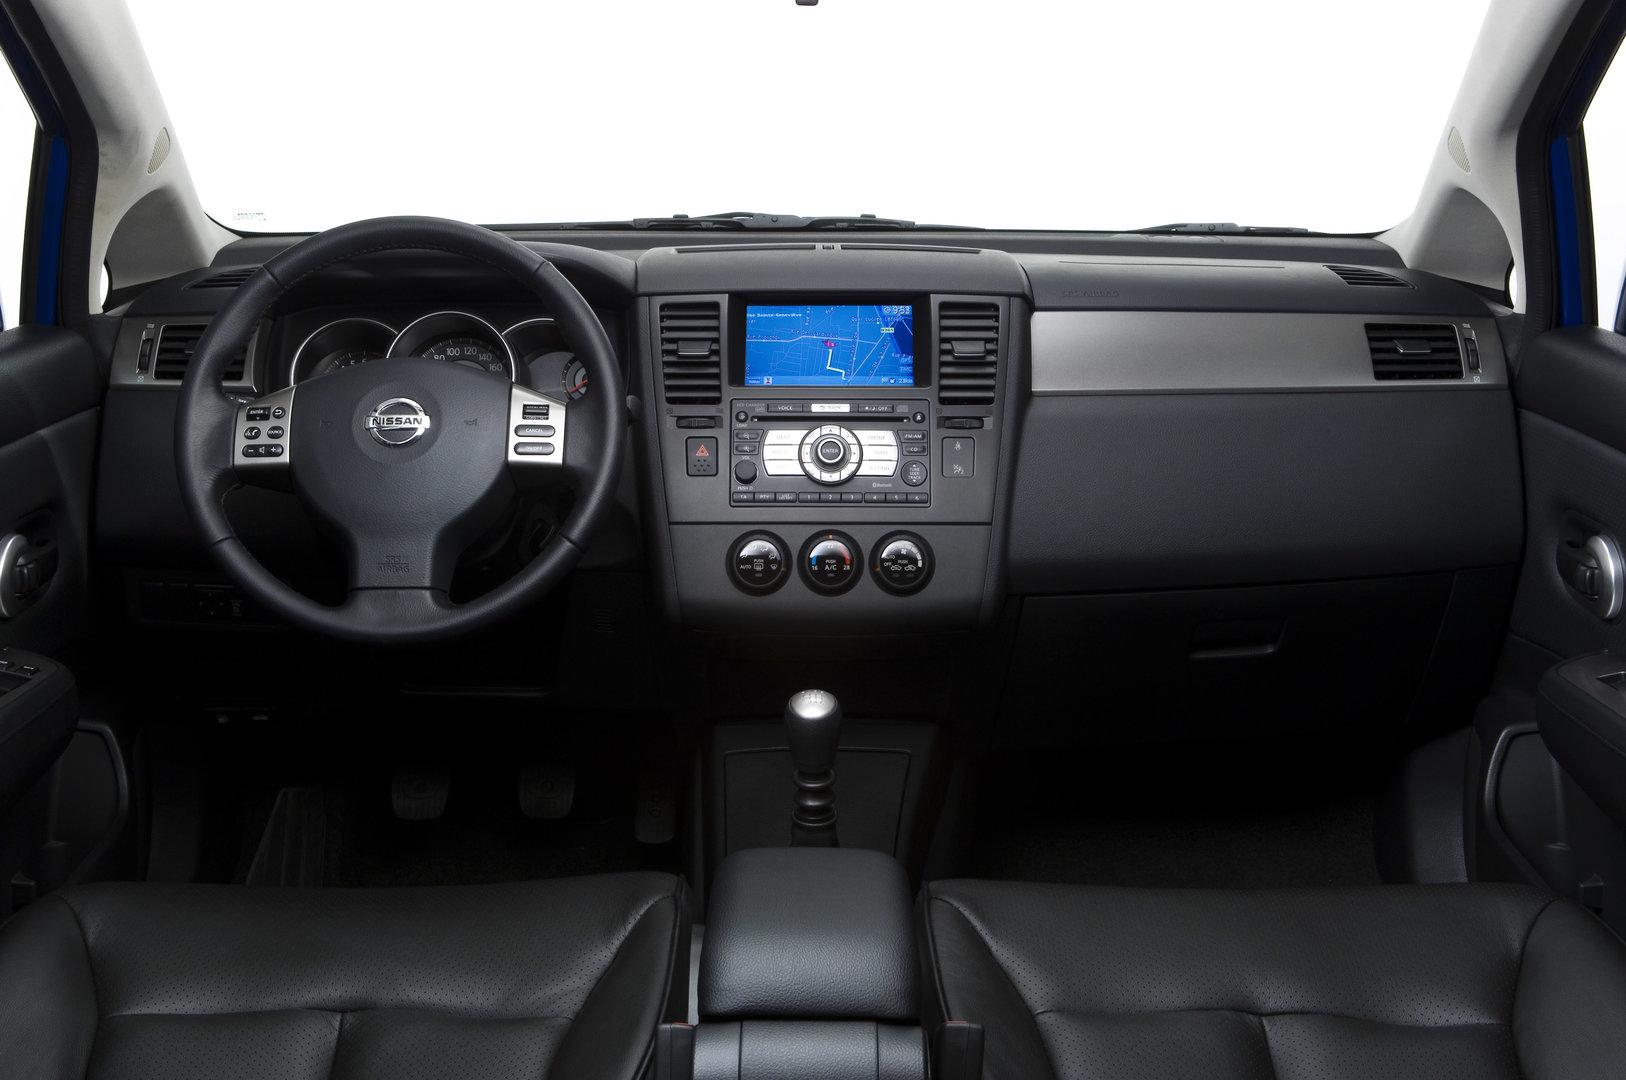 Nissan Tiida hatchback C11 6